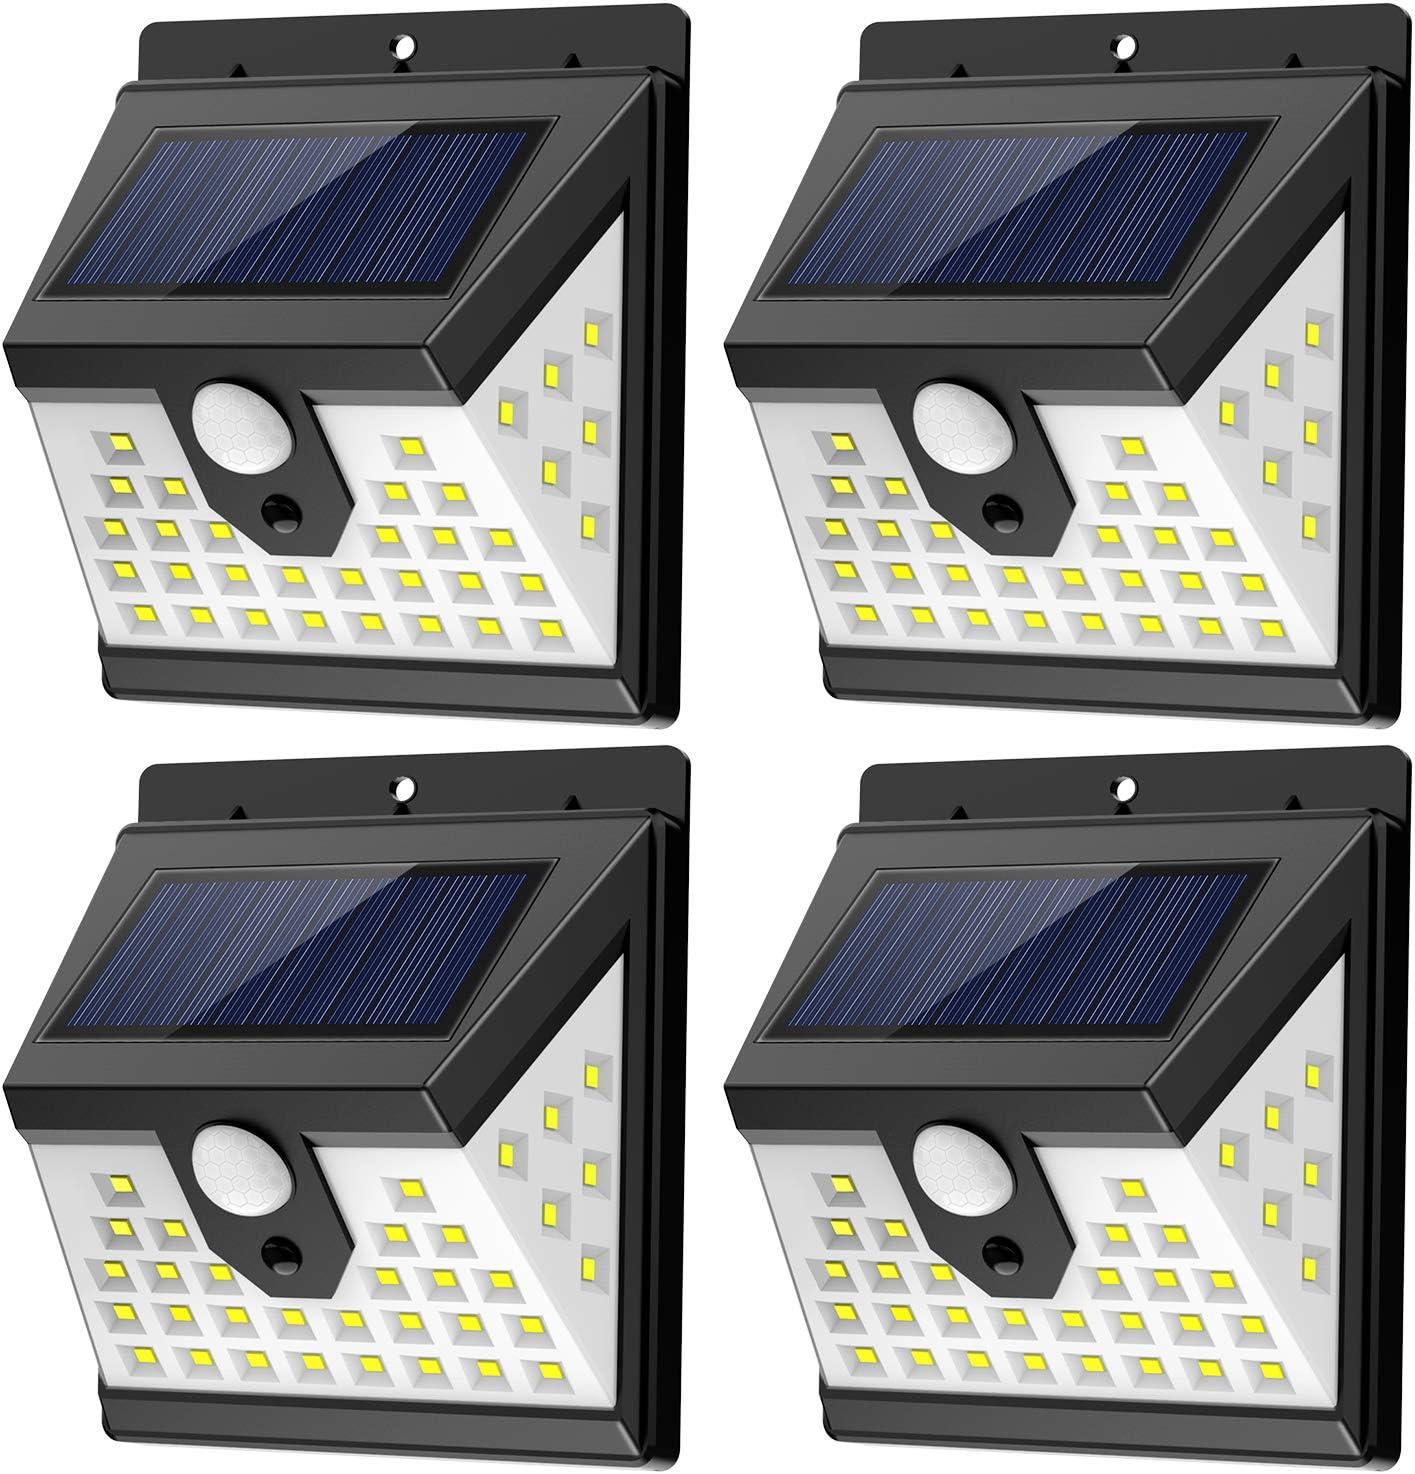 Details about  /24LED Diamond Solar Power Lights PIR Motion Sensor Waterproof Wall Spotligh